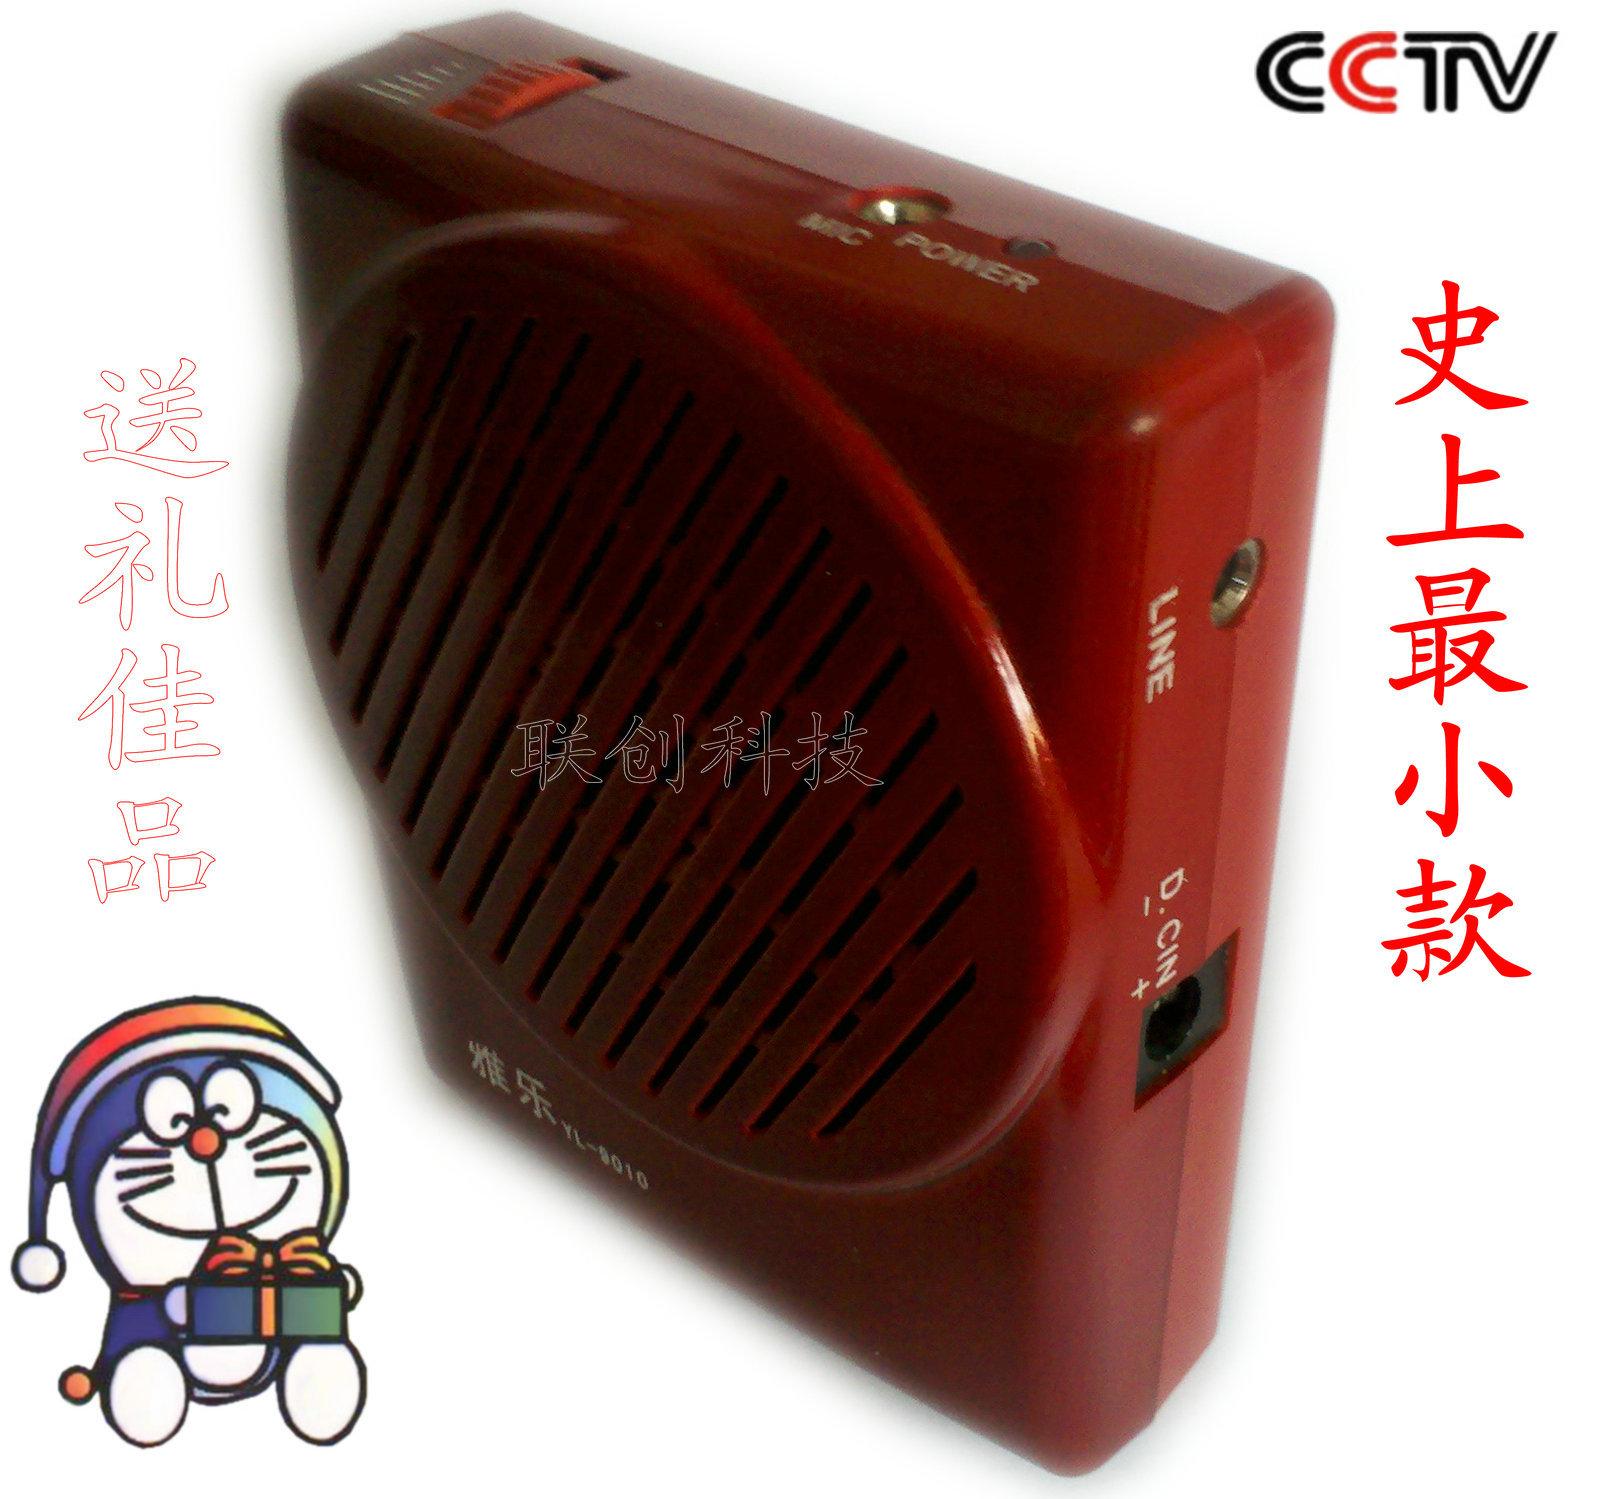 Громкоговоритель Gagaku  YL-9010 MP3